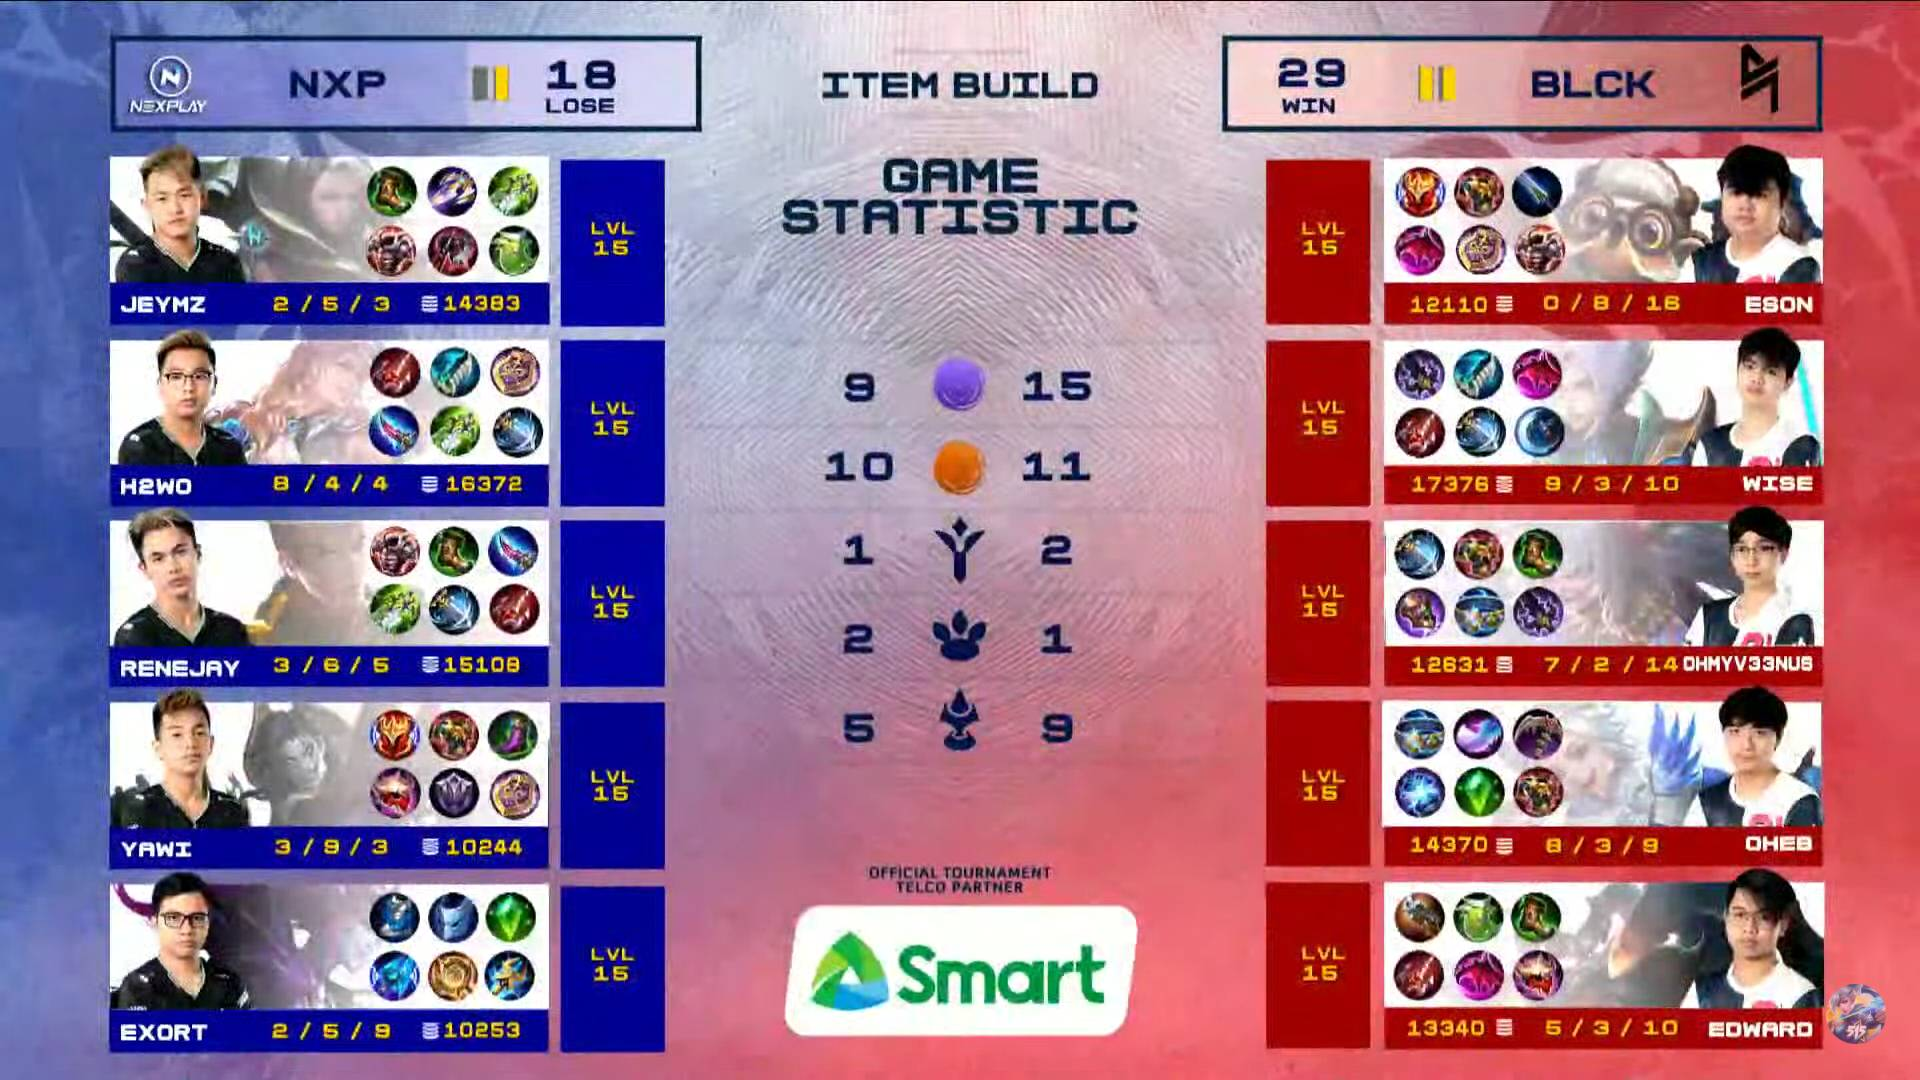 MPL-PH-Season-7-Blacklist-def-Nexplay-Game-Three Blacklist survives Renejay-H2wo hijack, ends MPL PH elims at top spot ESports Mobile Legends MPL-PH News  - philippine sports news